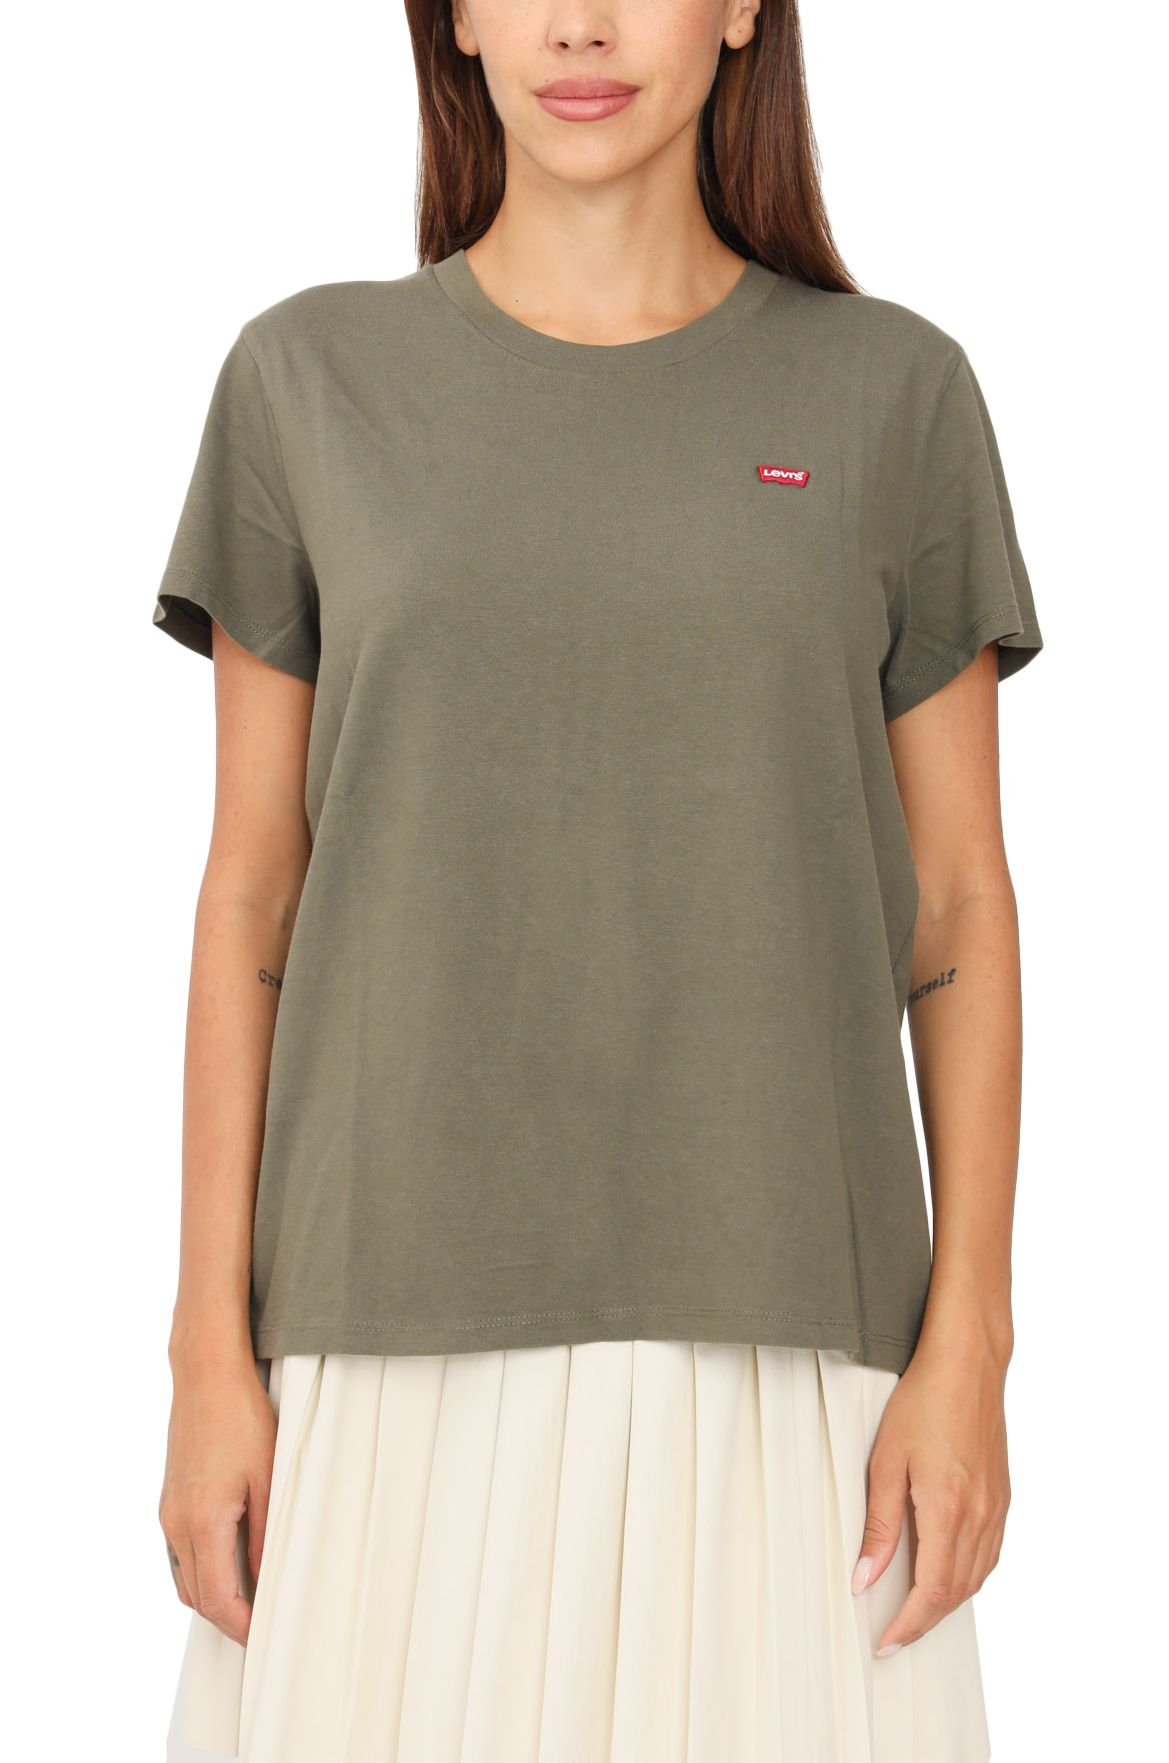 T-Shirt Levis PERFECT TEE Sea Turtle